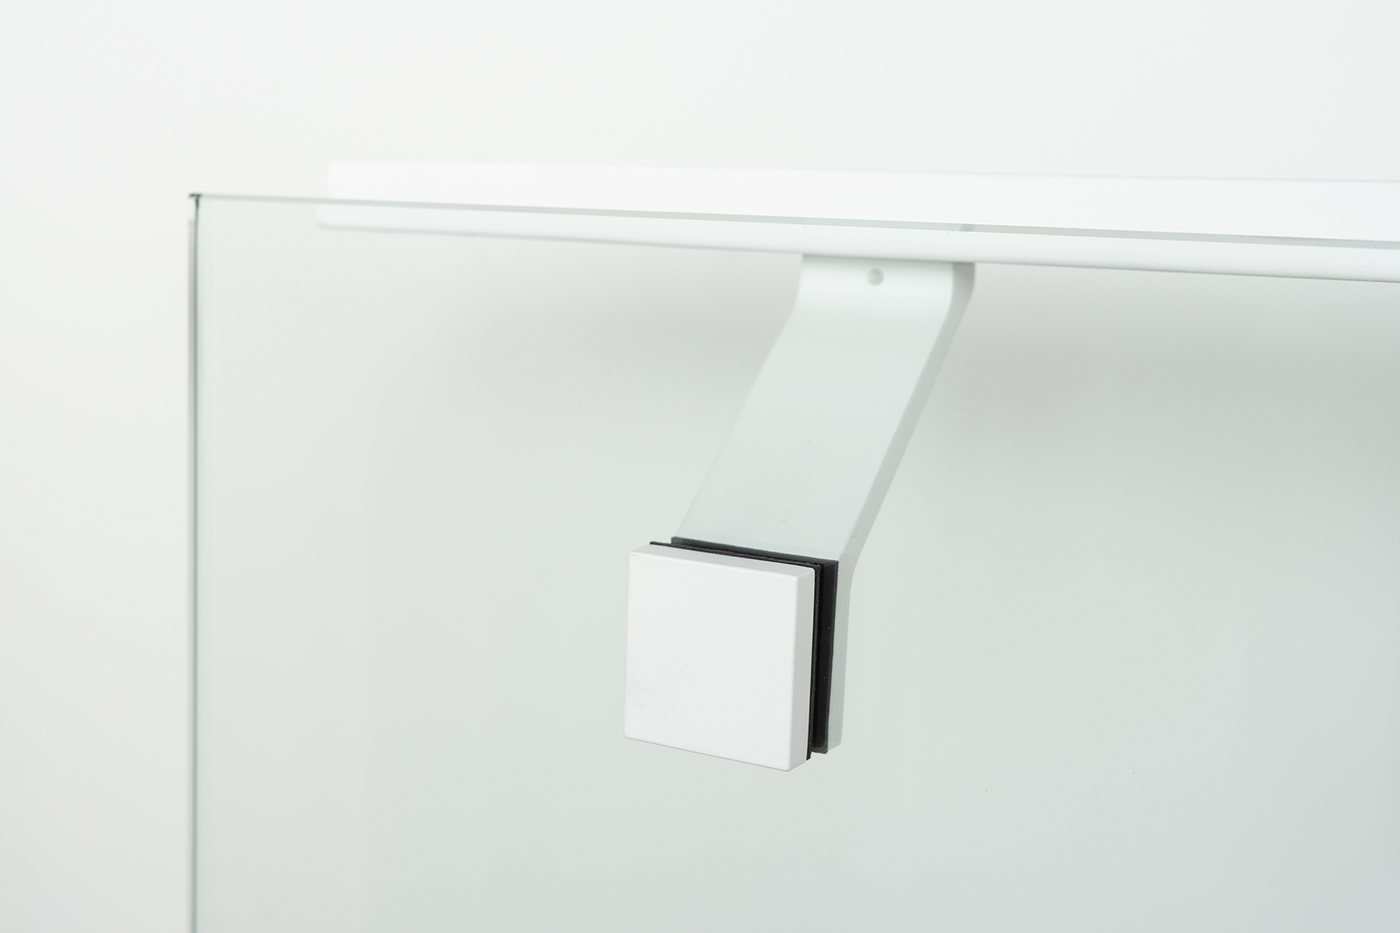 Modern-glass-mounted-handrail-bracket